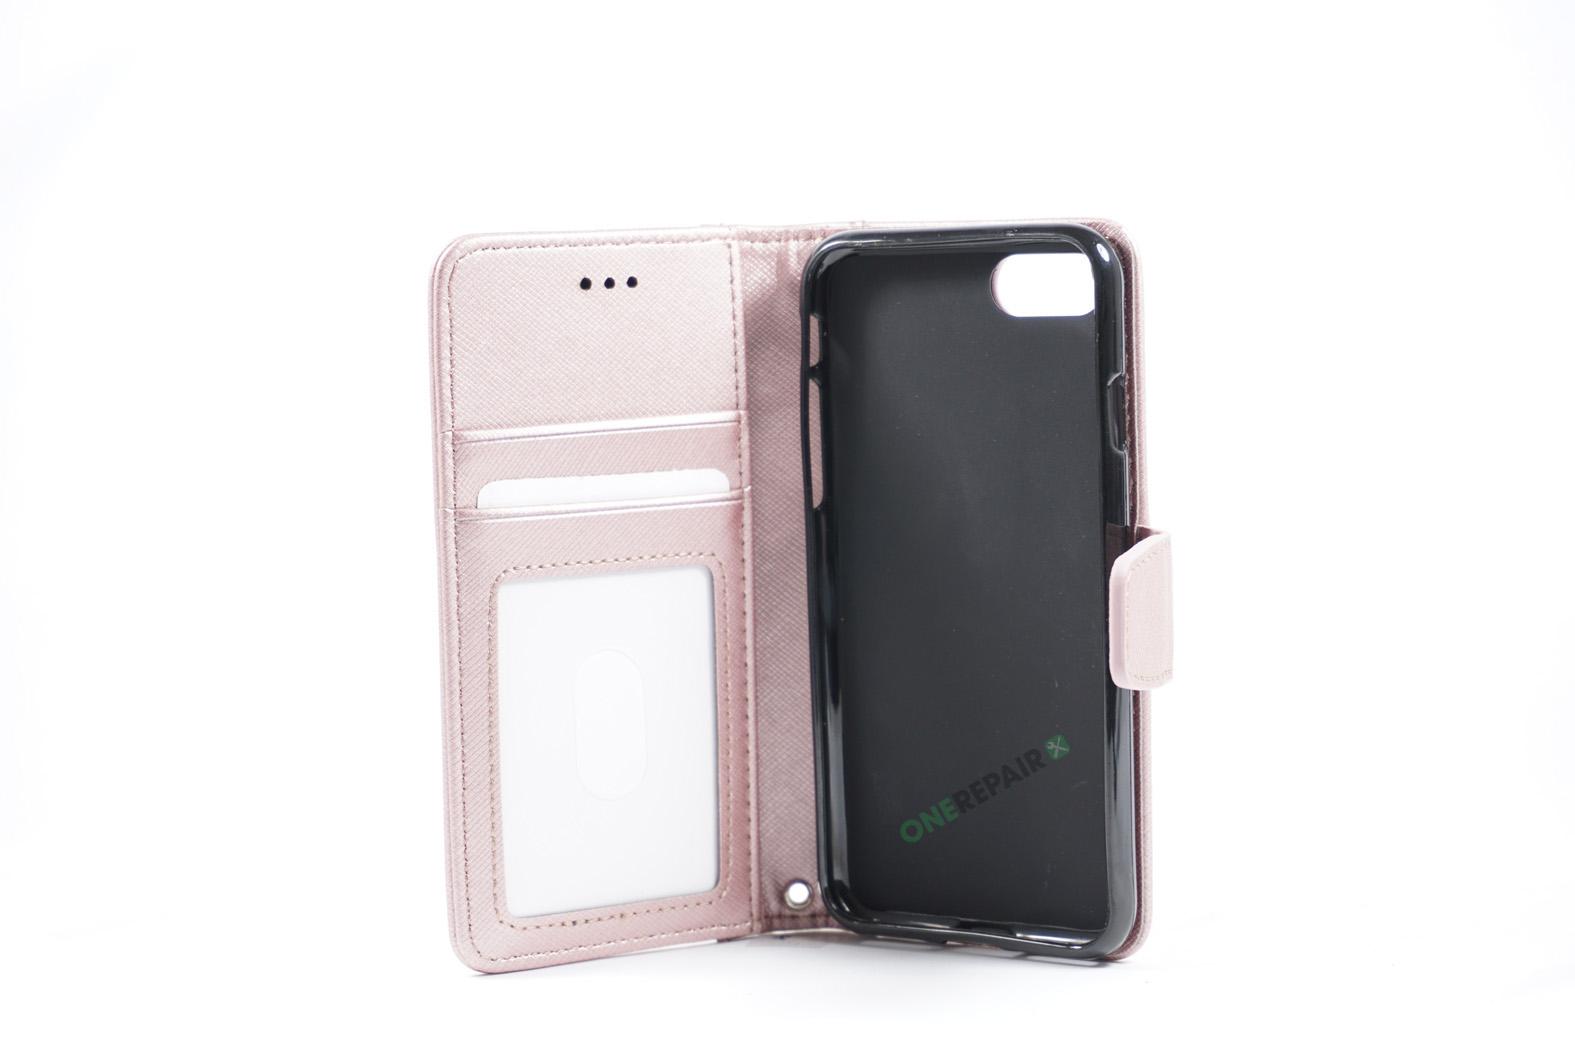 350788_iPhone_7_8_Luxury_Flipcover_Cover_Lyseroed_Pink_OneRepair_WM_00002